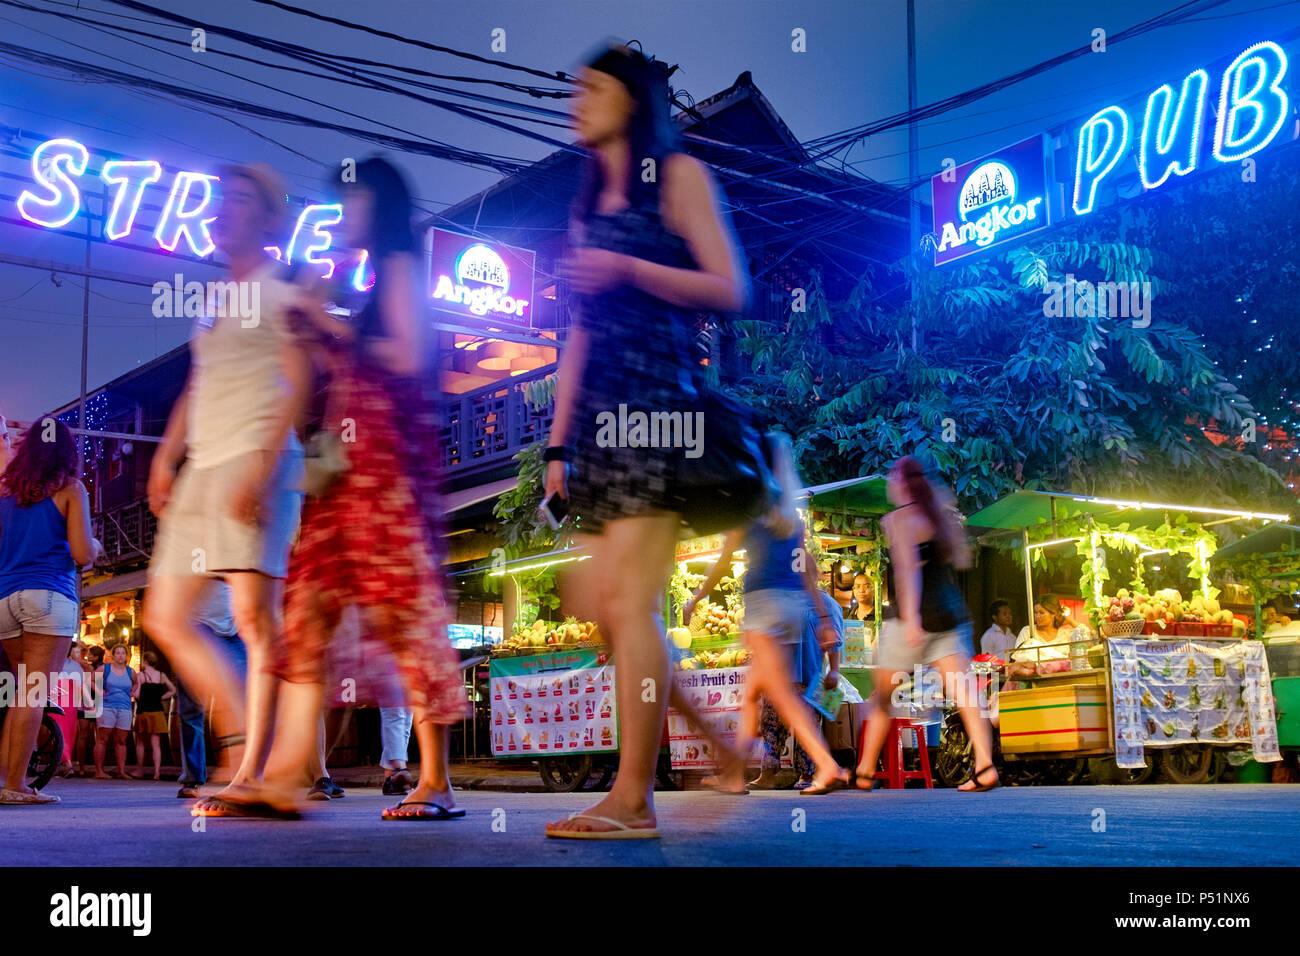 Tourists in Pub street, Siem Reap, Cambodia Stock Photo